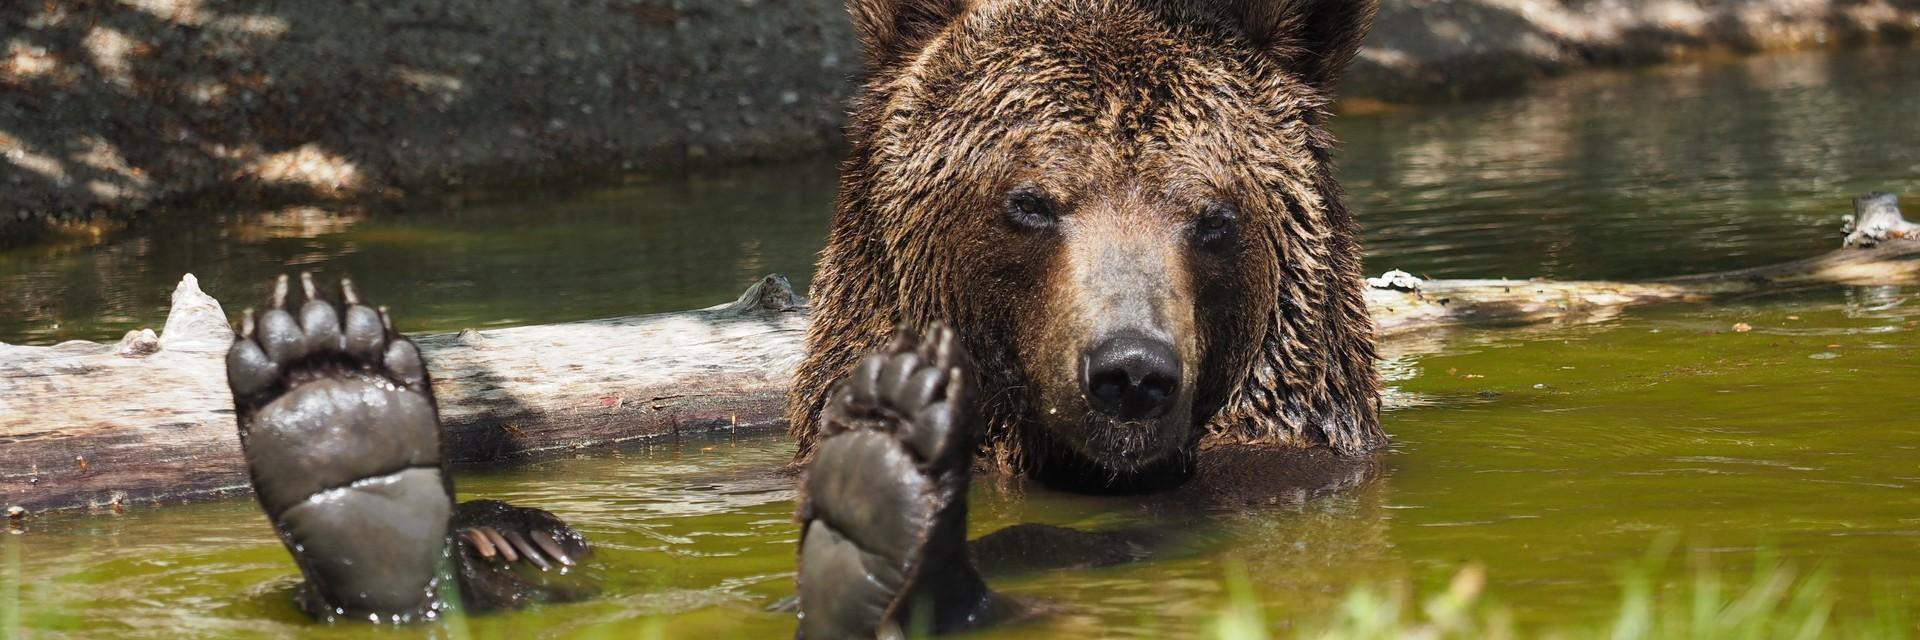 Bear Erich at the Bear Sanctuary Arbesbach